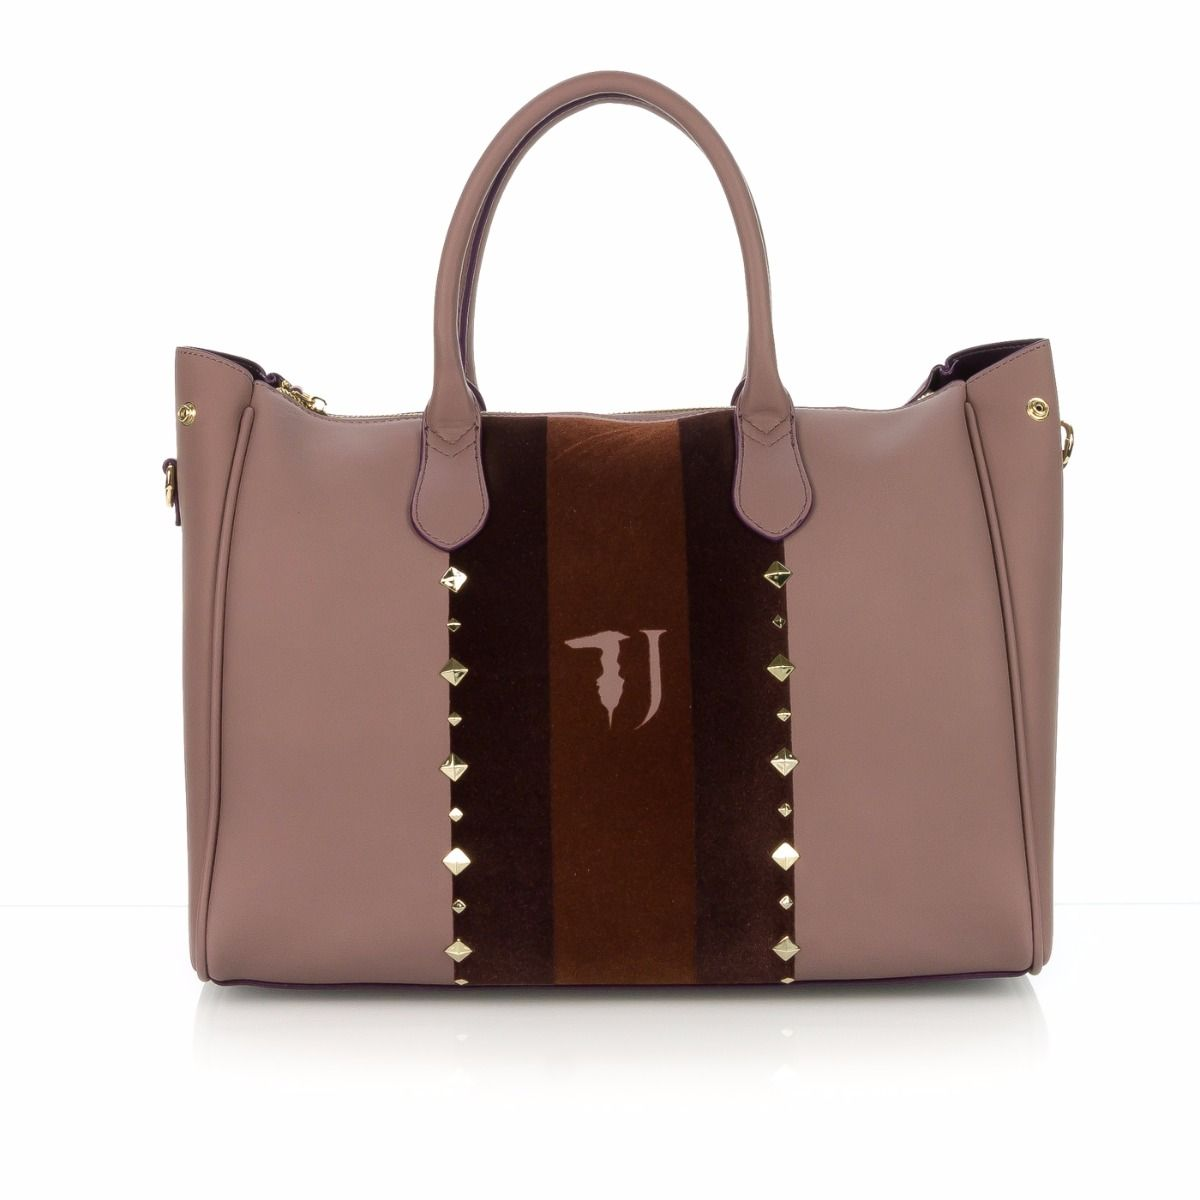 Da Jeans Trussardi Donna Blondie Shopping W002 Bag 75b00173 IPwq7Z5B